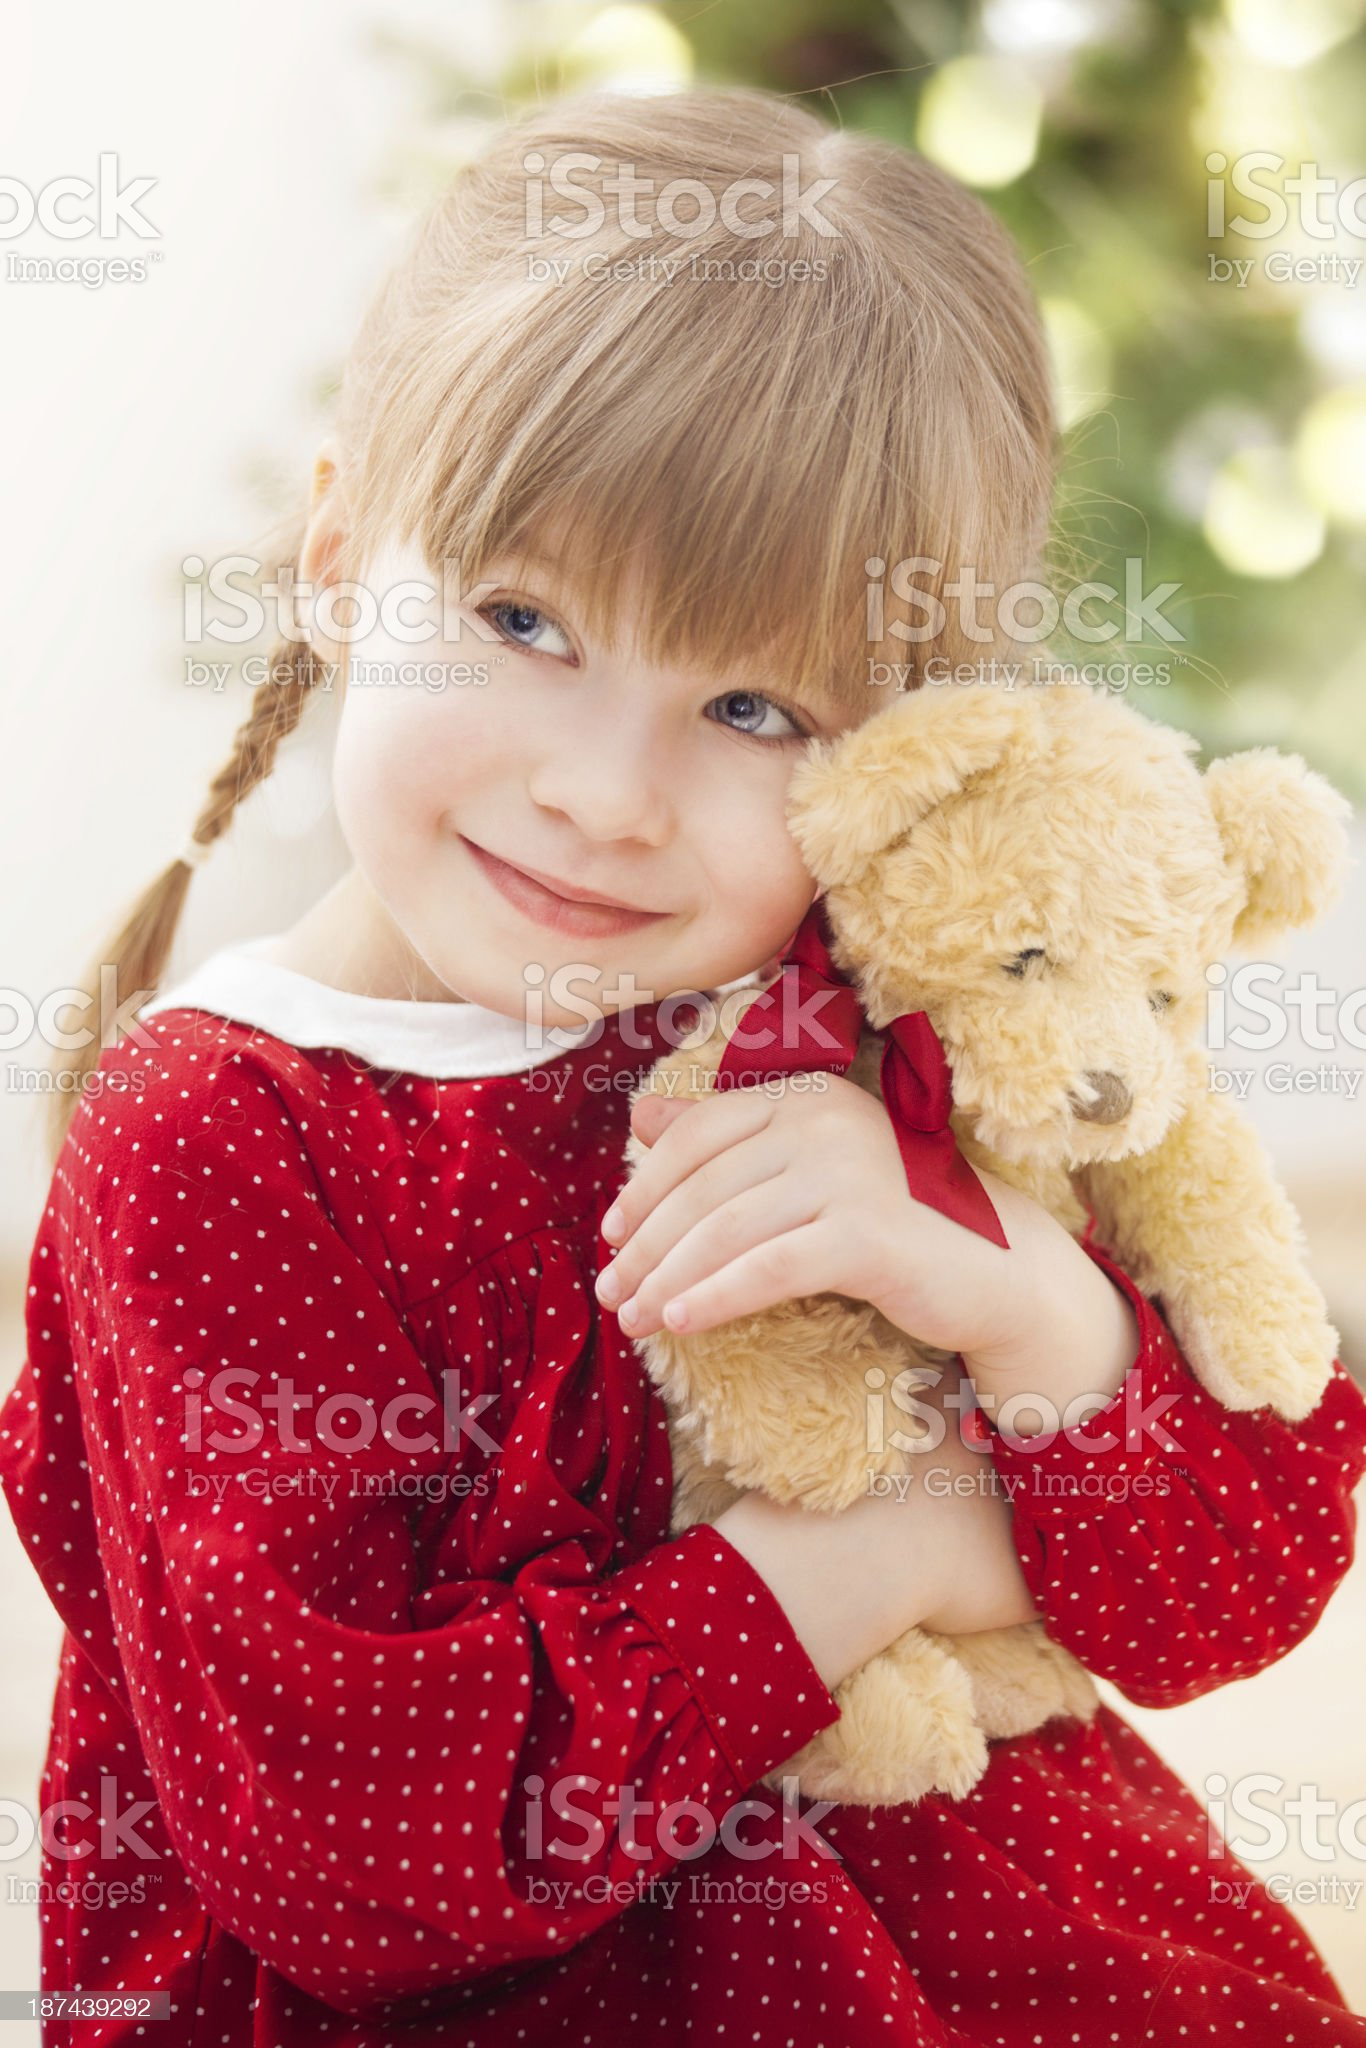 Little girl embracing teddy bear royalty-free stock photo